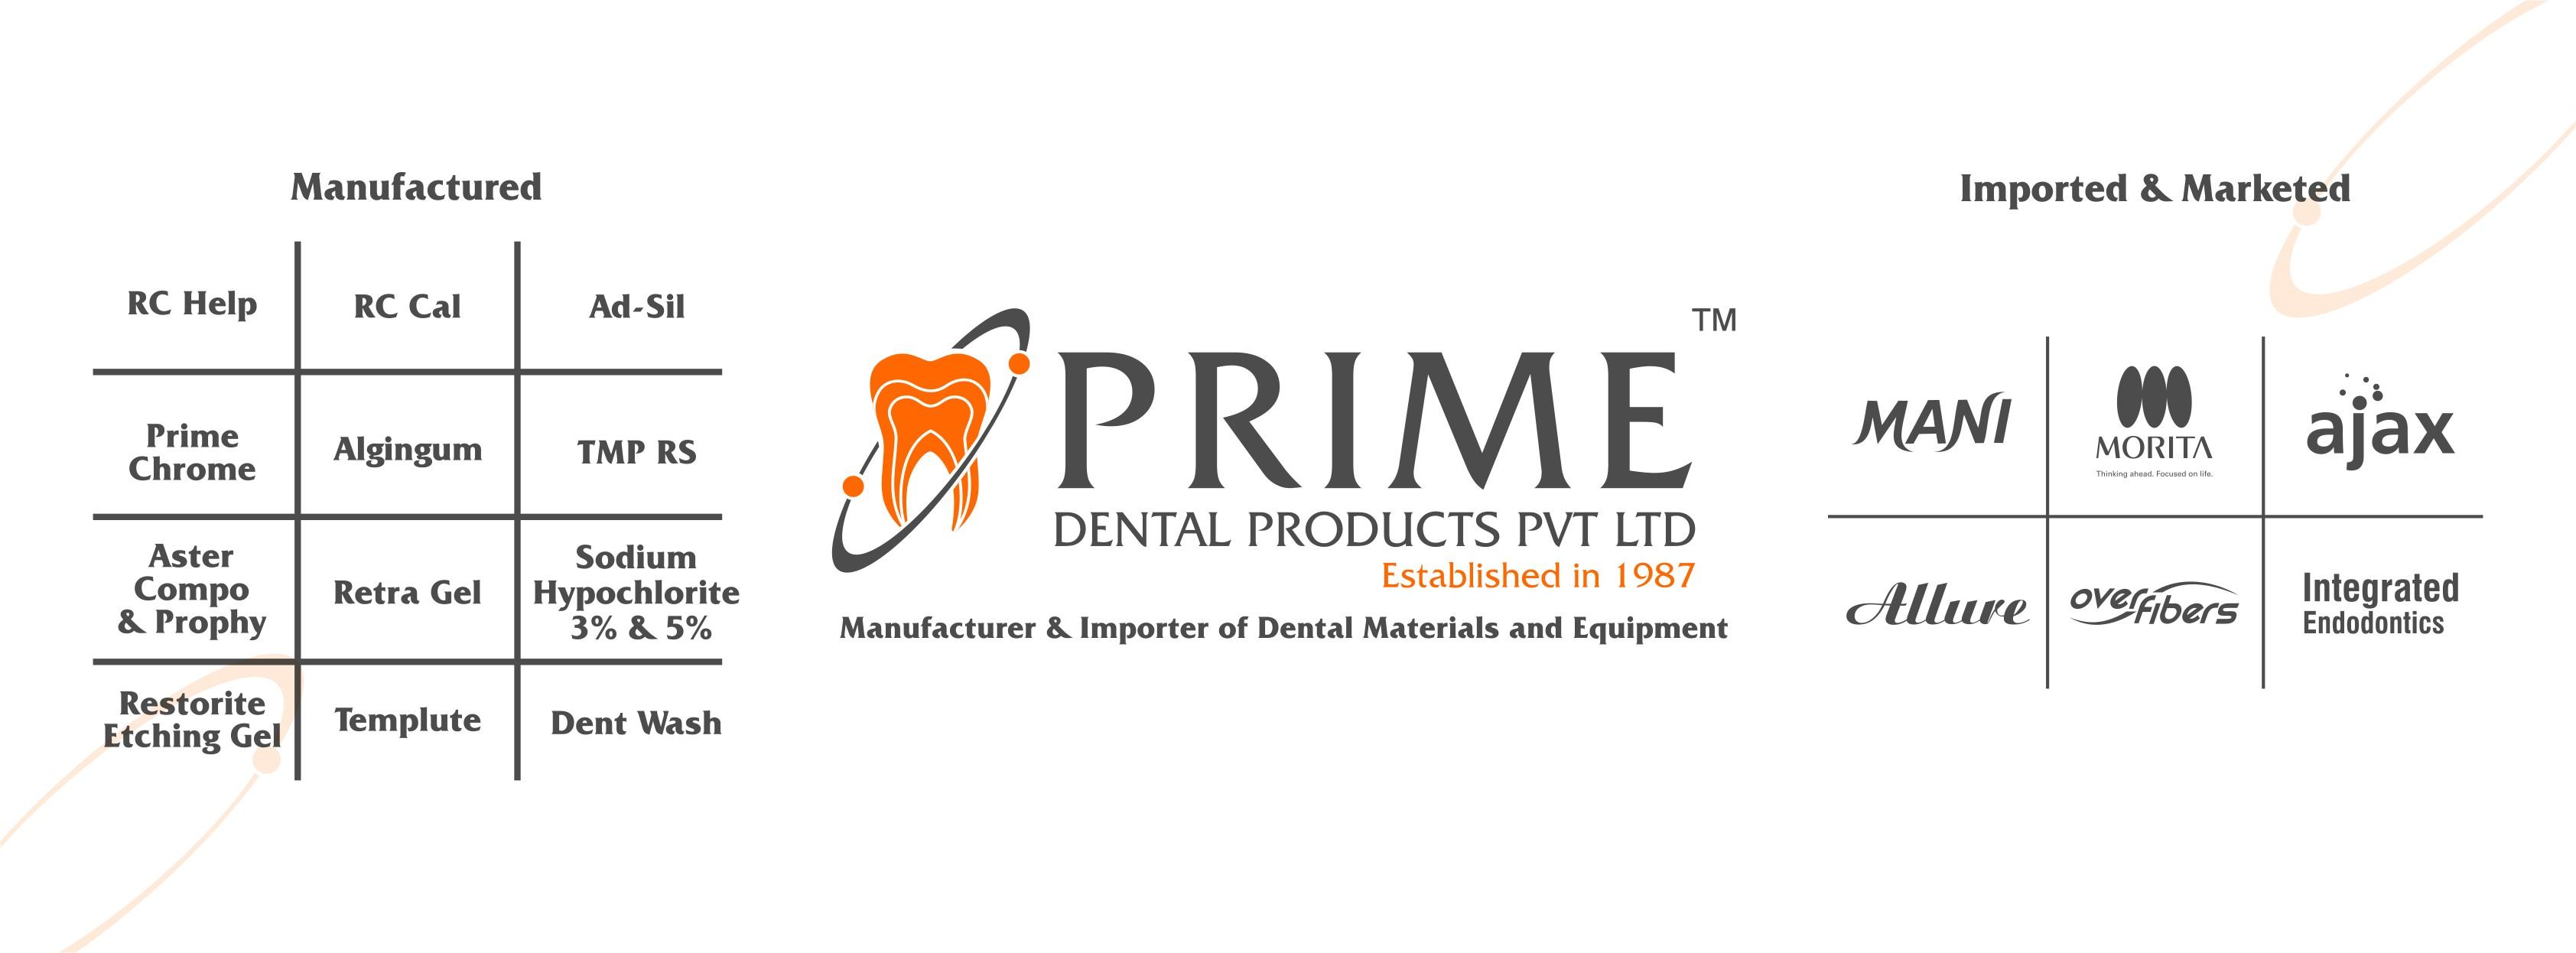 Prime Dental Products Pvt Ltd - India | LinkedIn